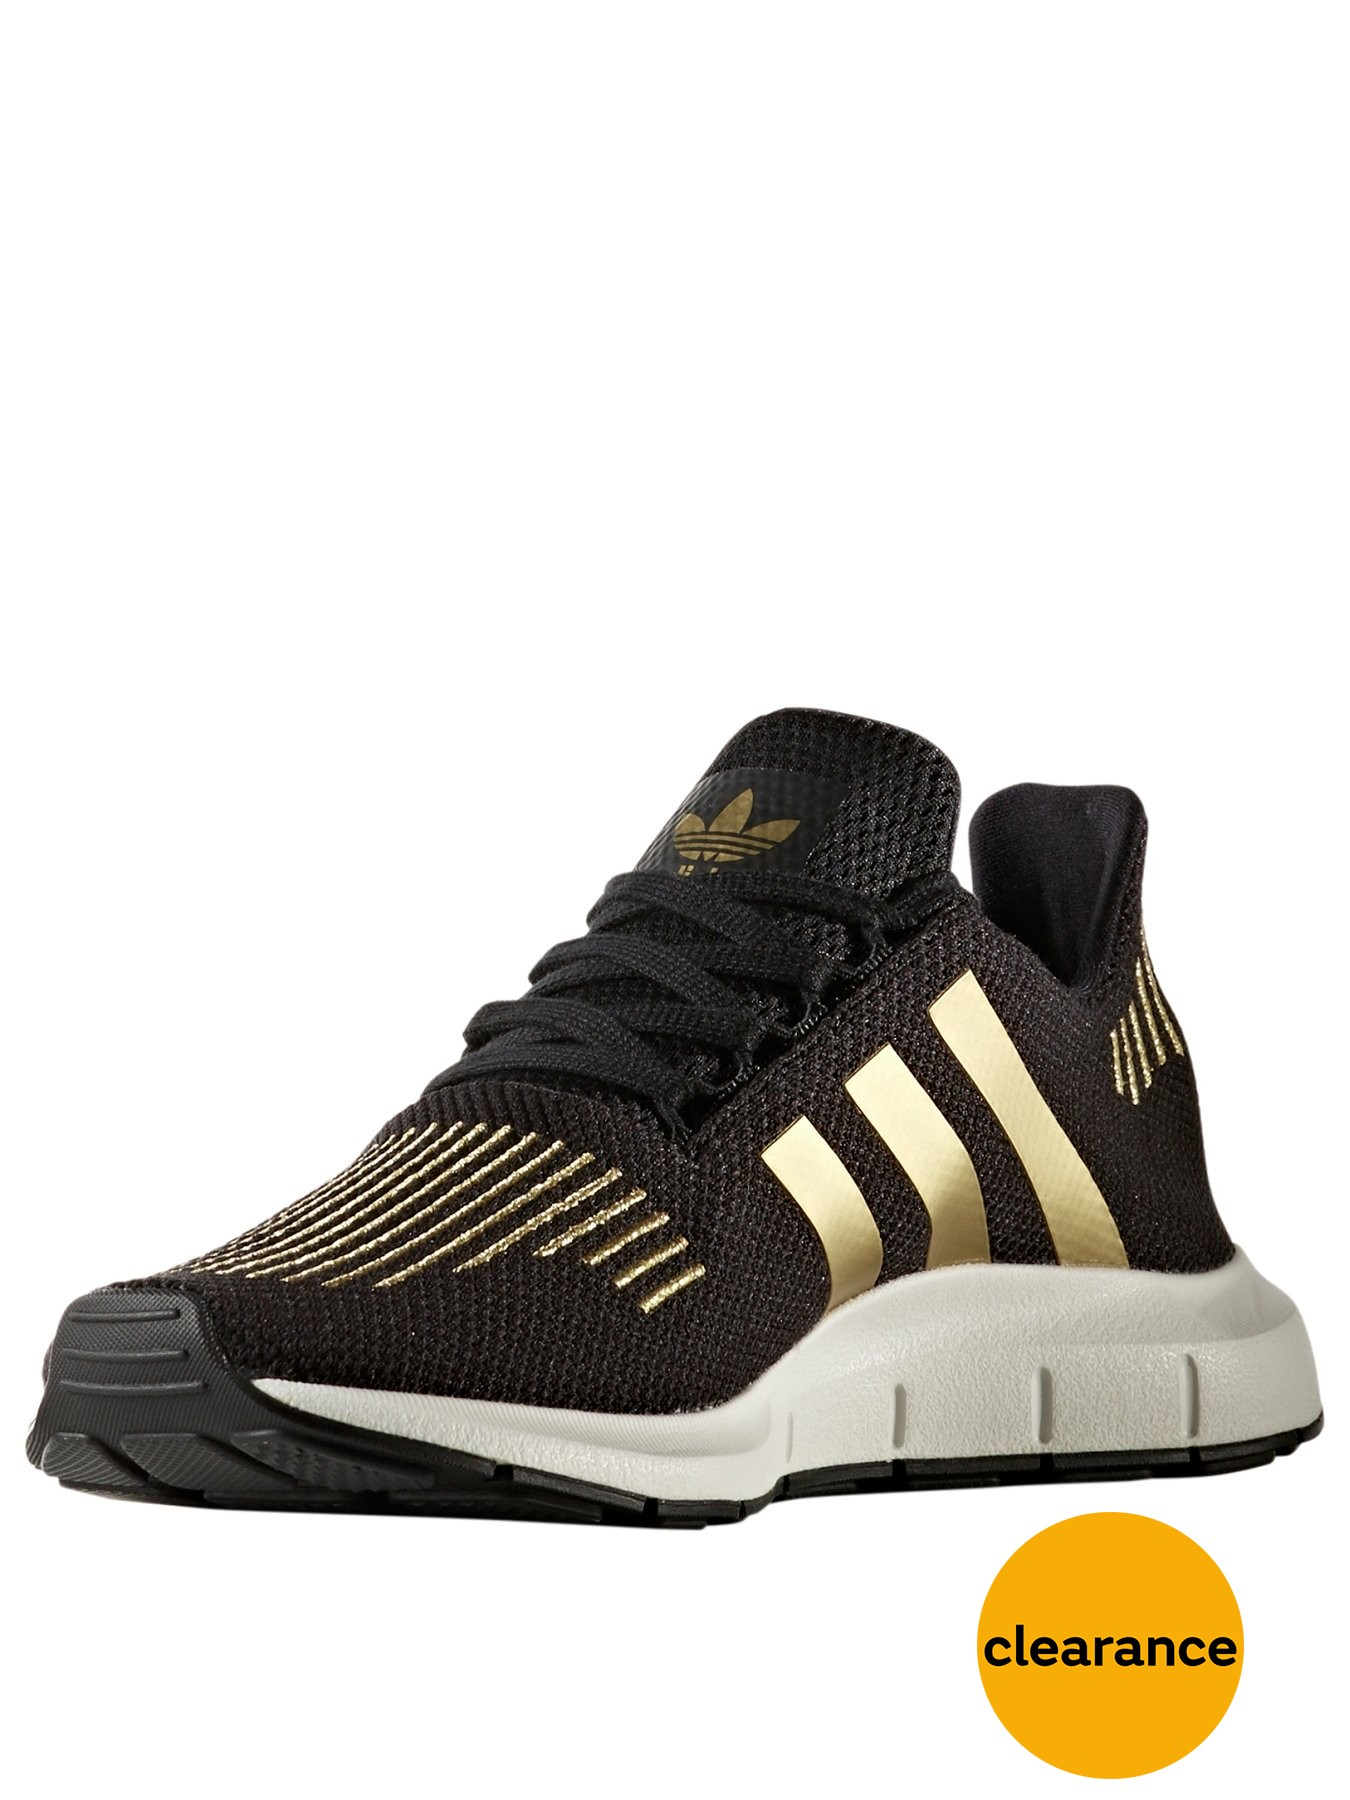 adidas Originals Swift Run Black/Gold 1600157791 Women's Shoes adidas Originals Trainers